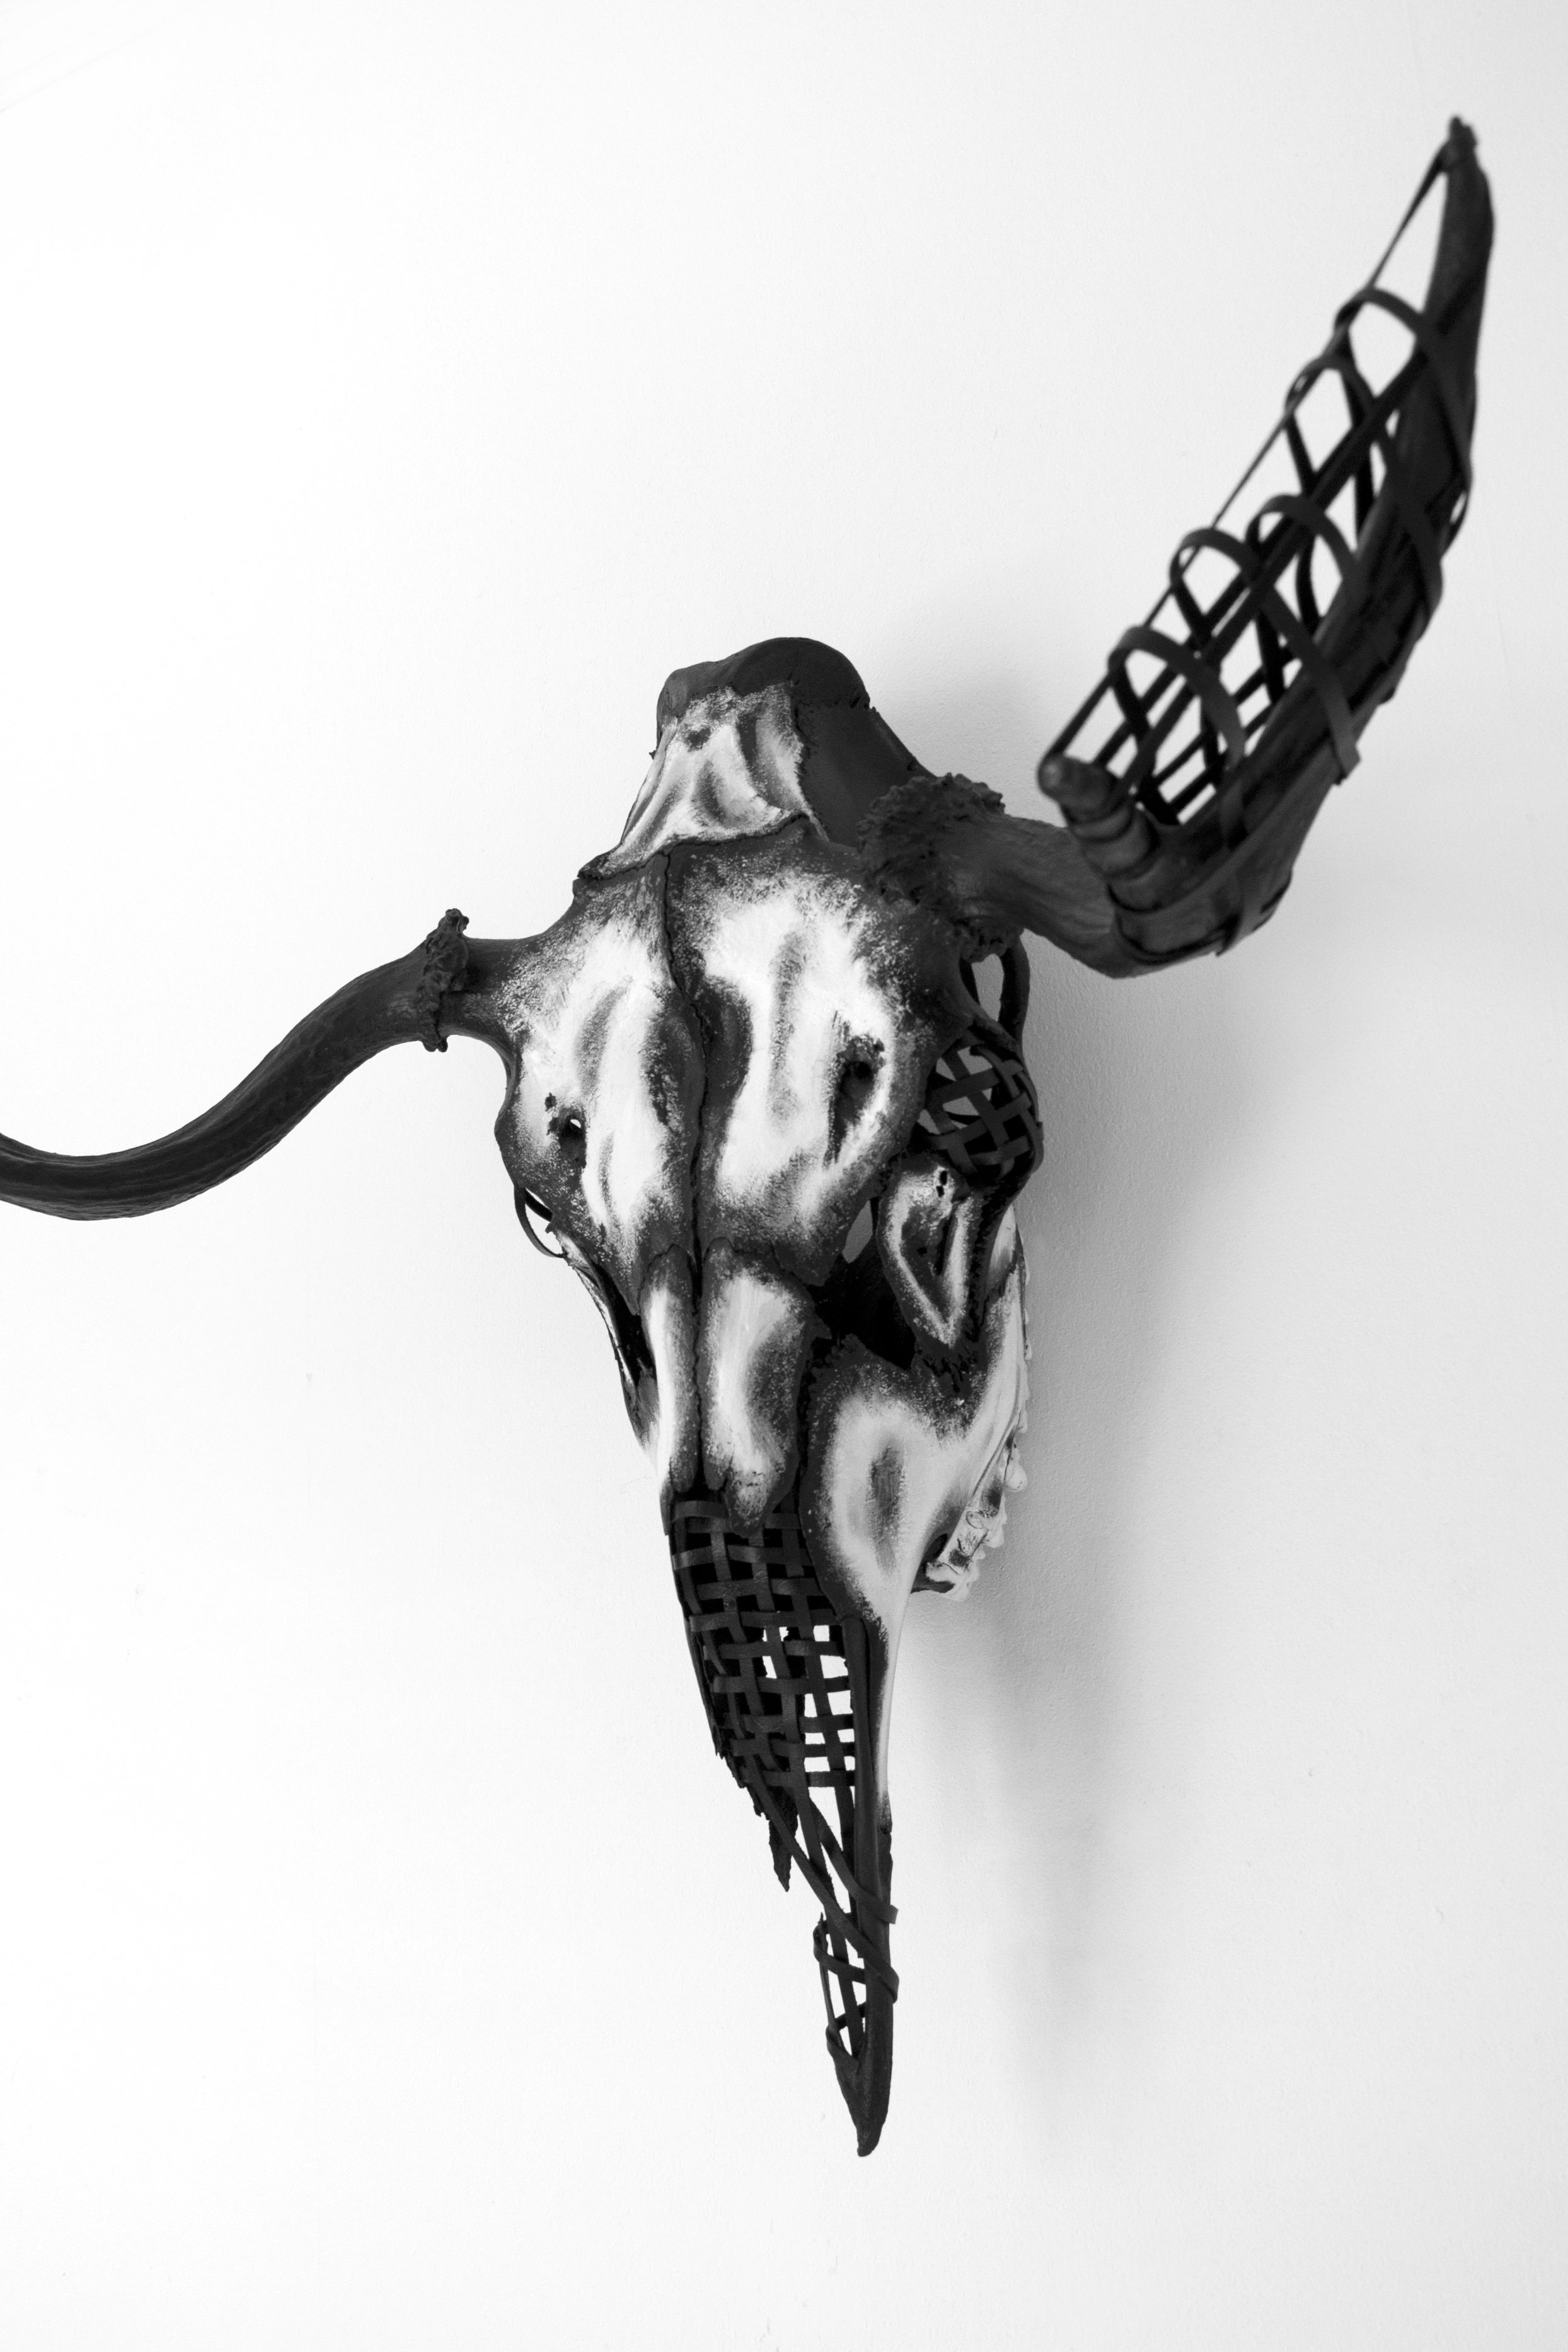 petra-shara-stoor-skull-art-vey-2.png